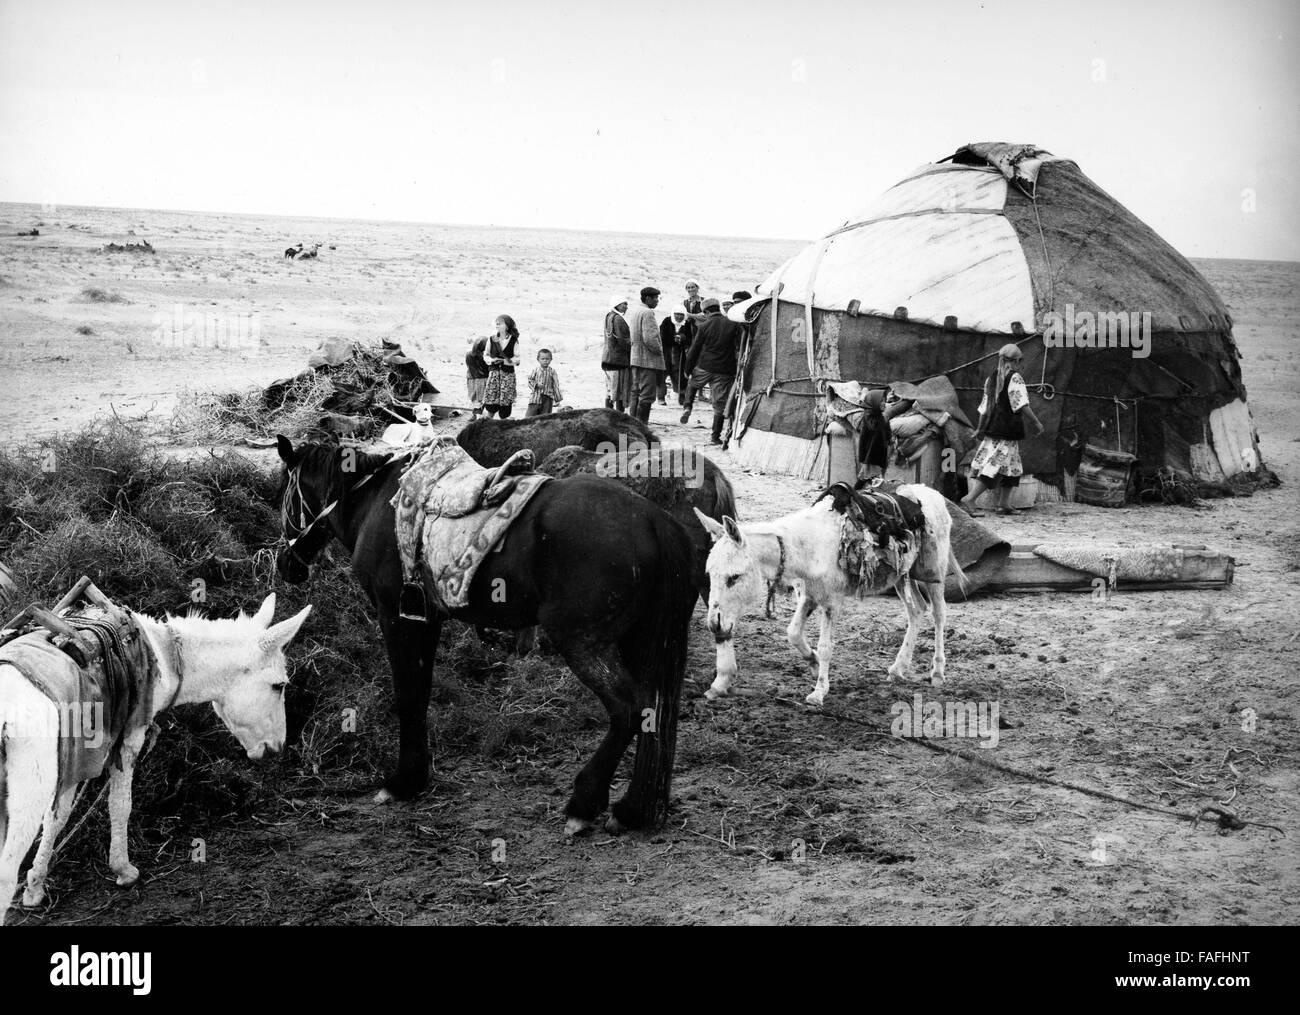 Nomadenjurte in der Kysylkum Wüste in Usbekistan, Bezirkshandstempel, 1970er Jahre. Nomad's Jurte in der Stockbild